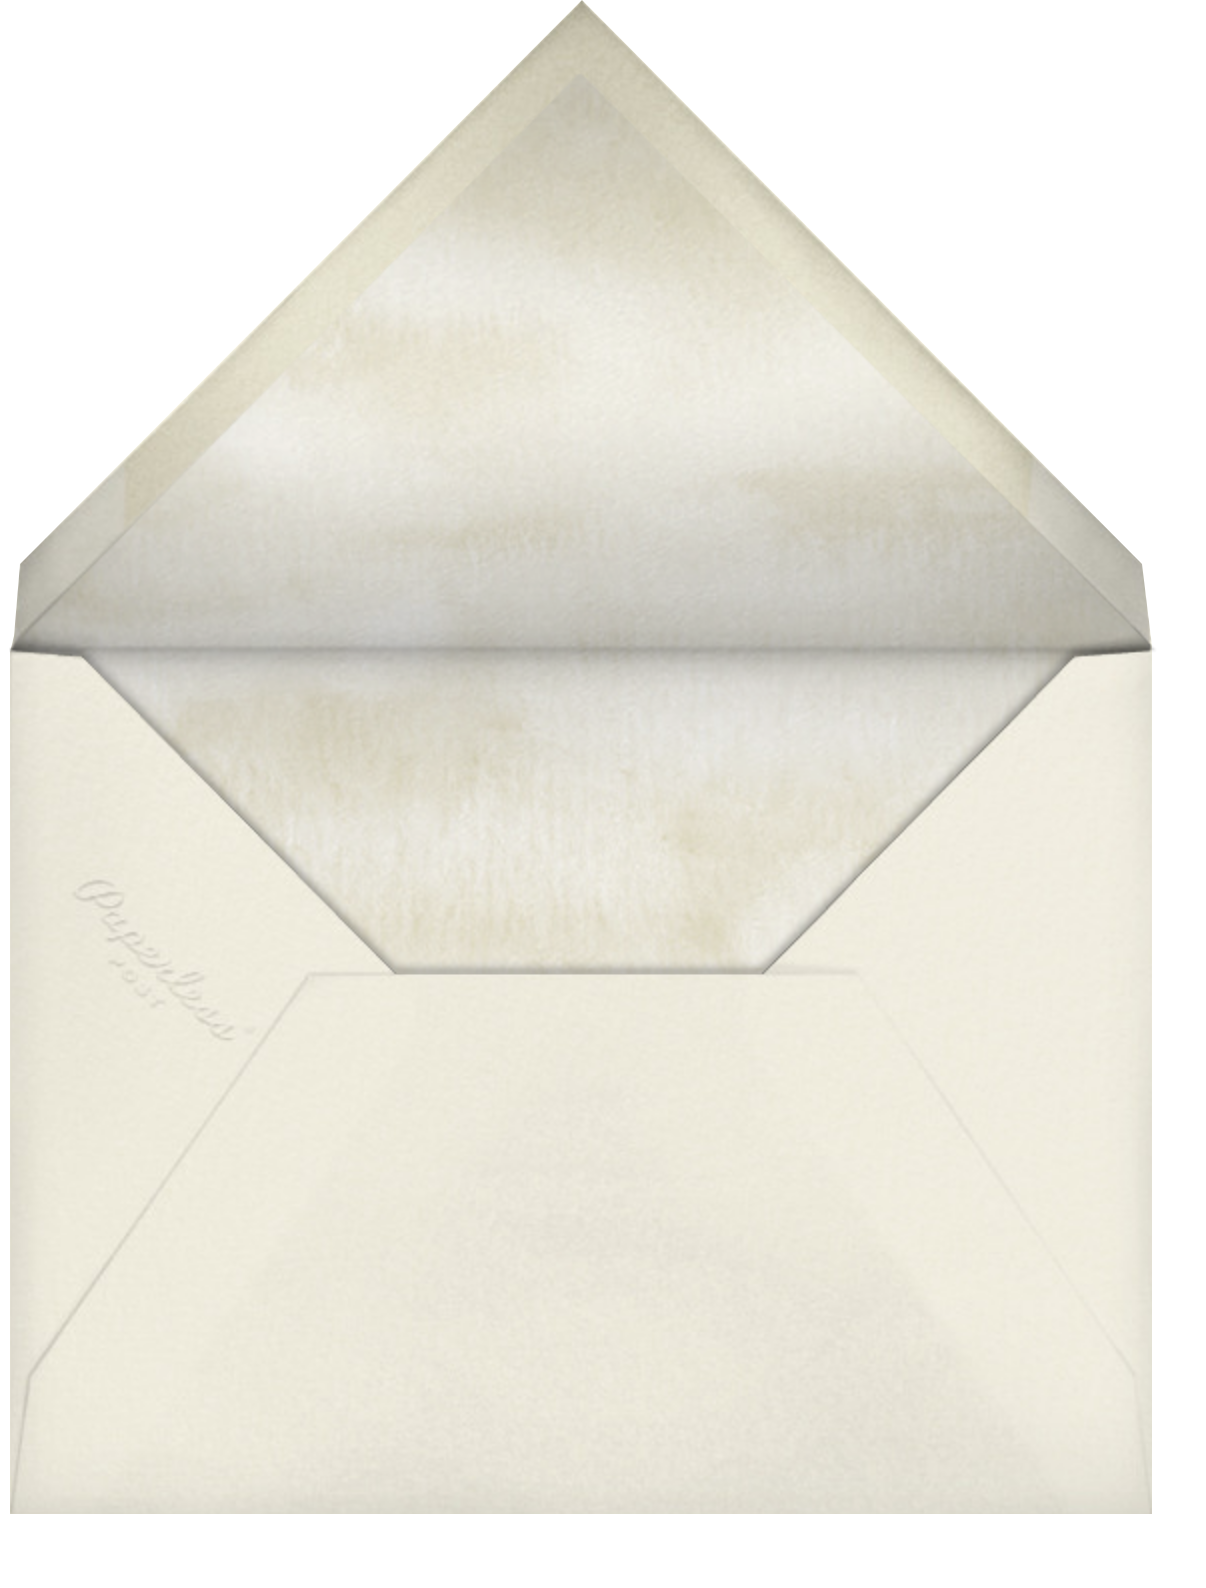 Convallaria Majalis - Felix Doolittle - Sympathy - envelope back